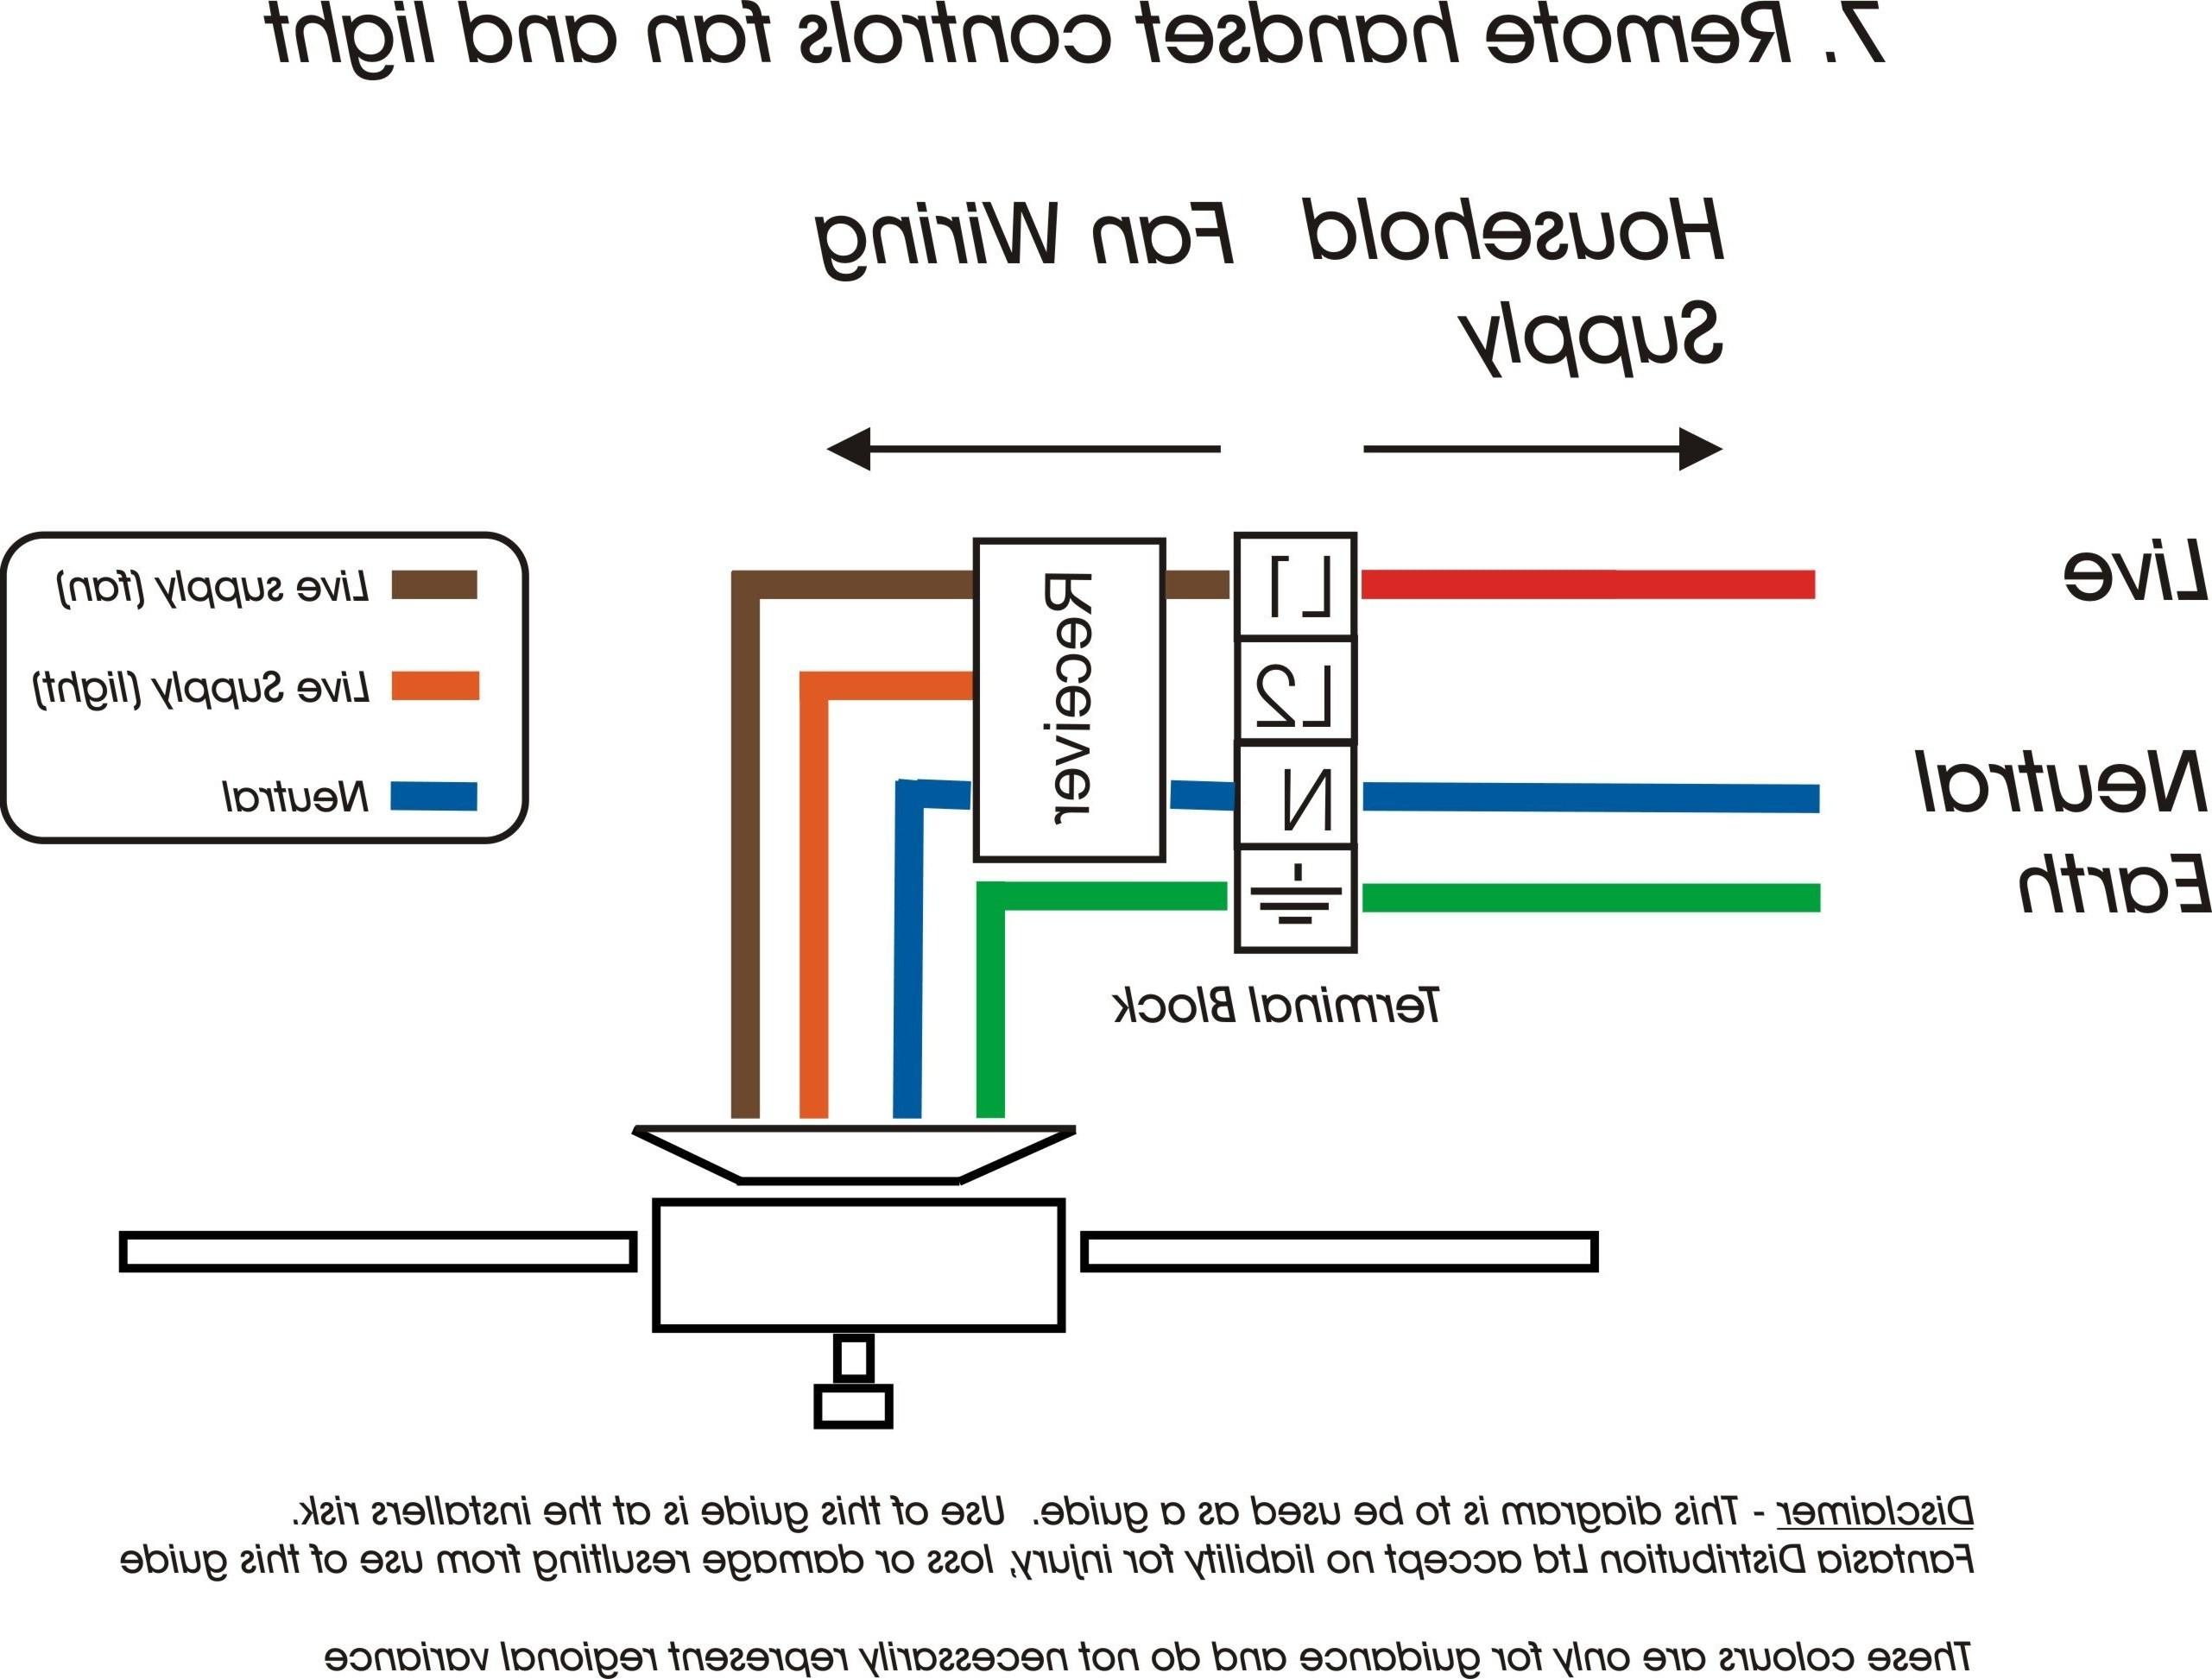 Lutron Maestro Led Dimmer Wiring Diagram Collection | Wiring Diagram on wiring diagram for headlight switch, wiring diagram for wiper switch, wiring diagram for pressure switch, wire diagram for fan switch, wiring diagram for neutral safety switch,